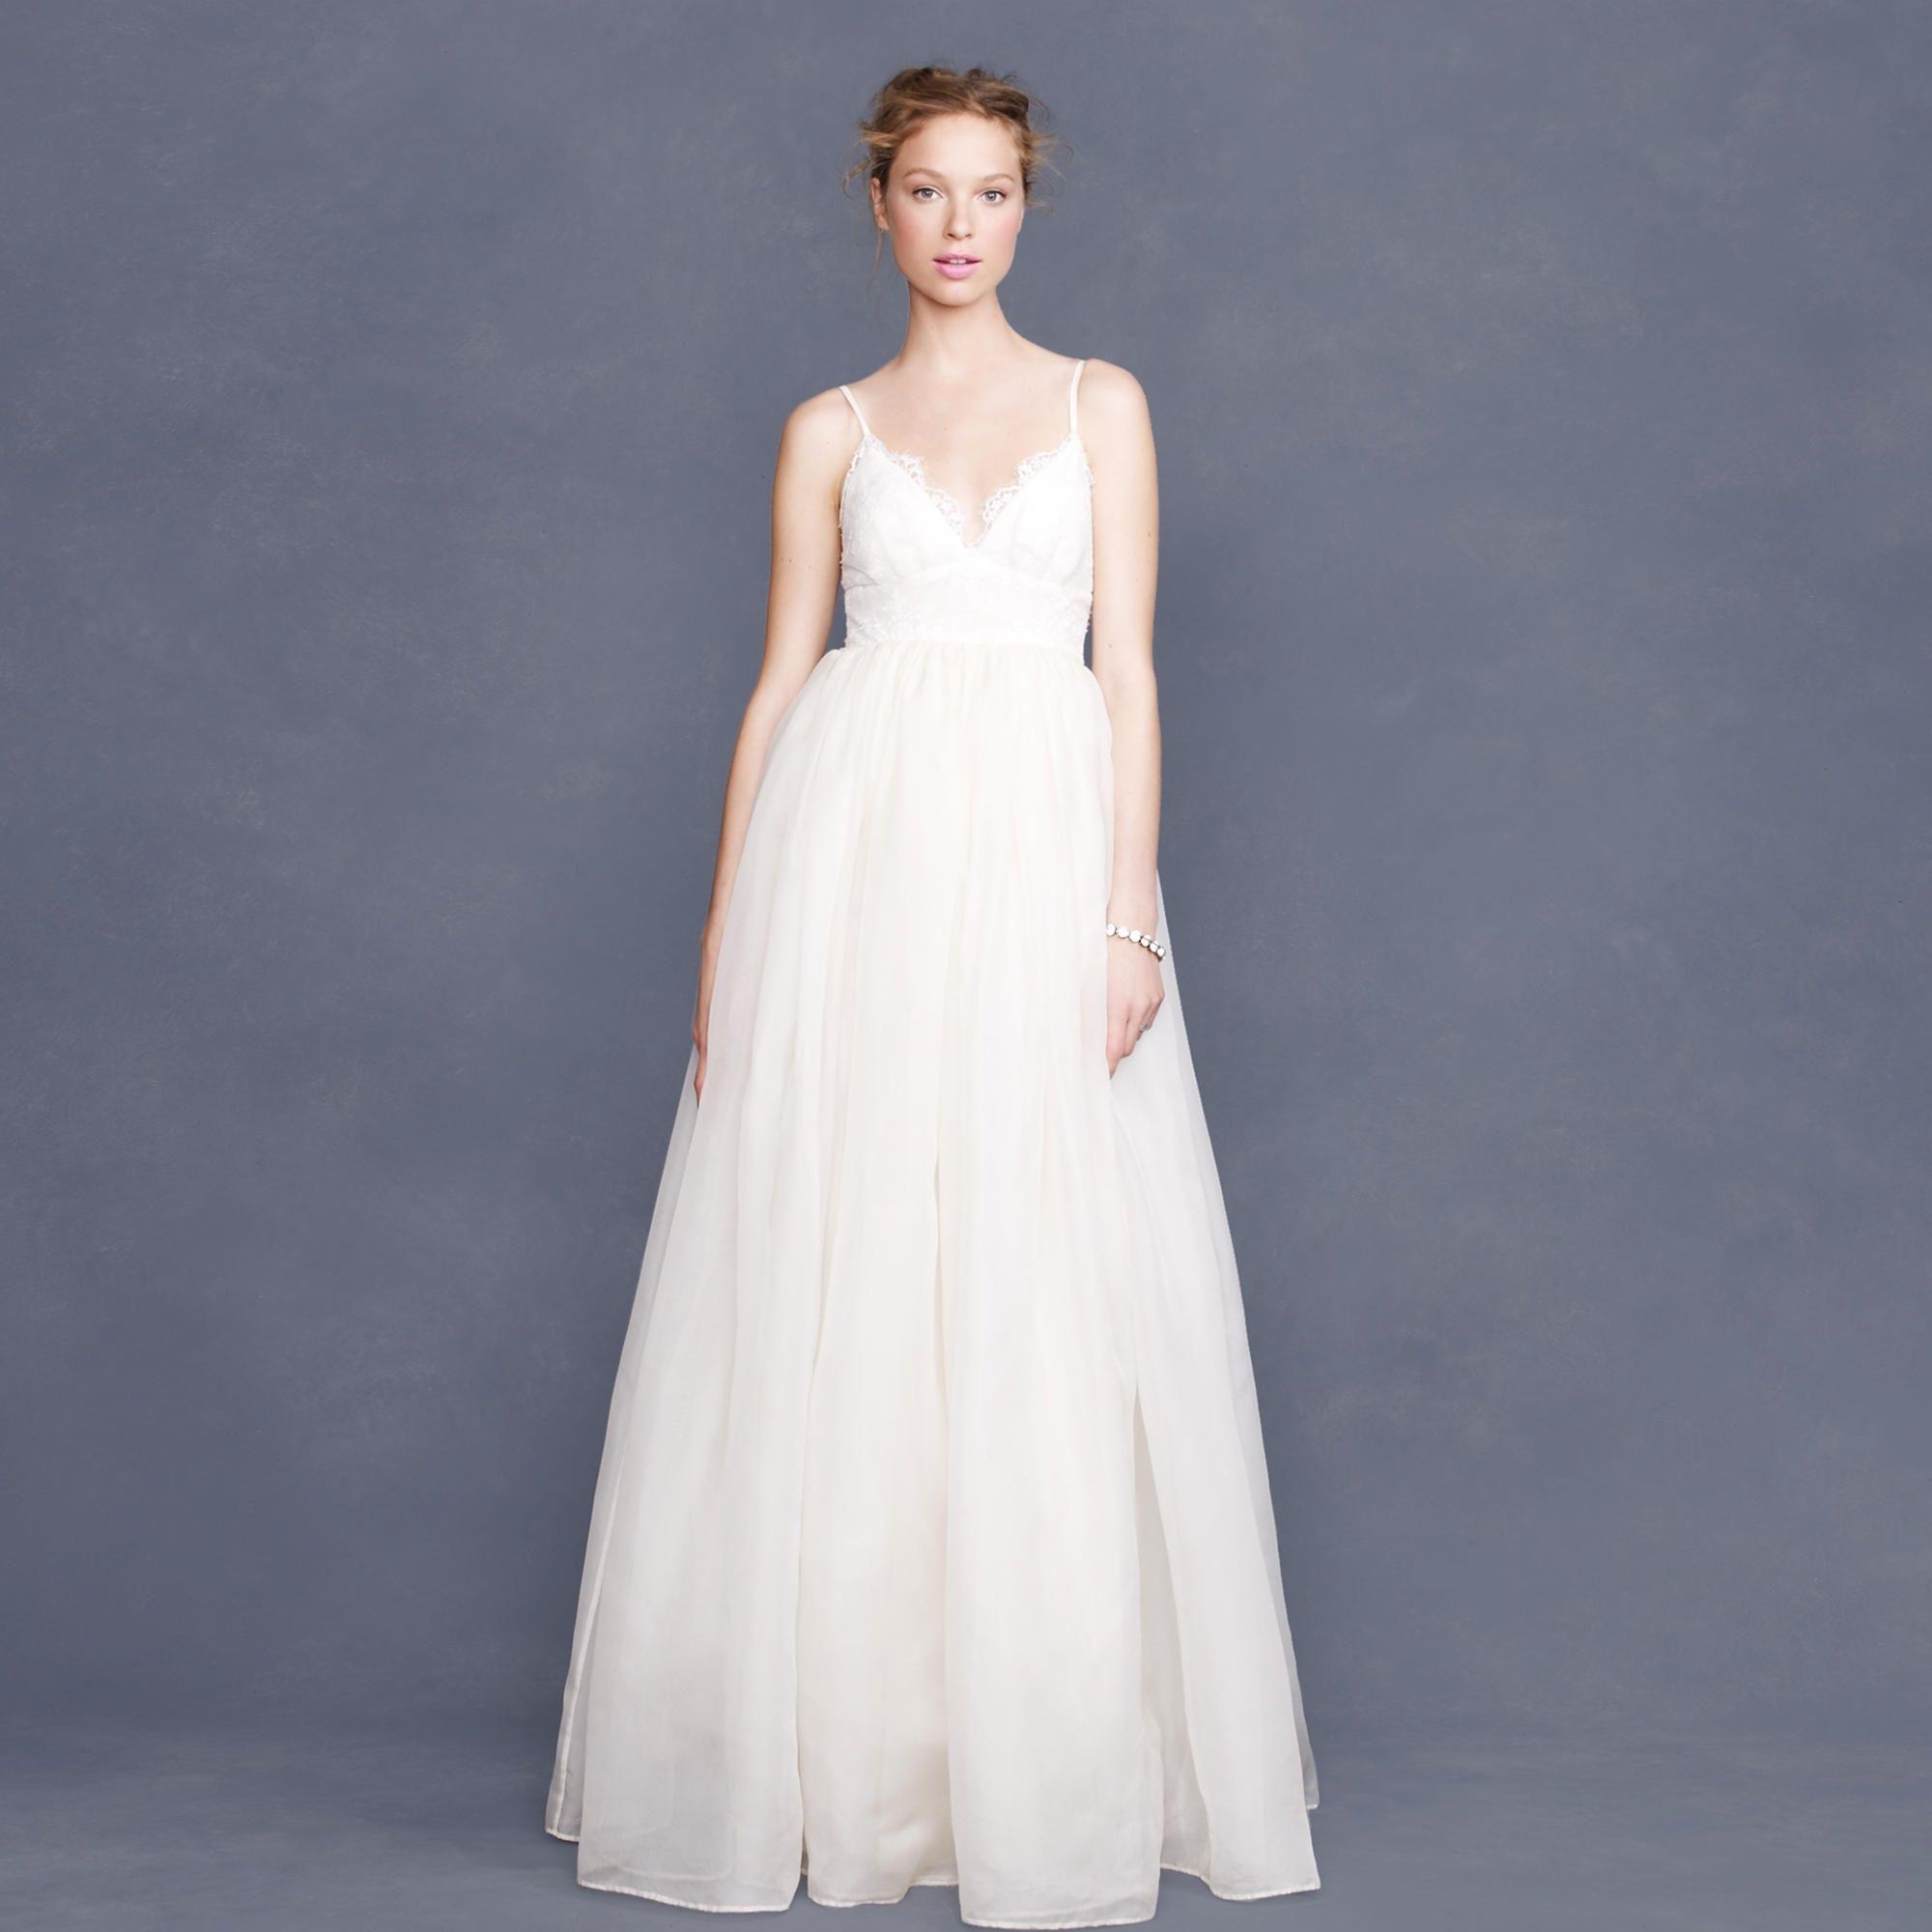 Ivory Cotton/Nylon Bodice and Silk Organza Skirt Principessa ...